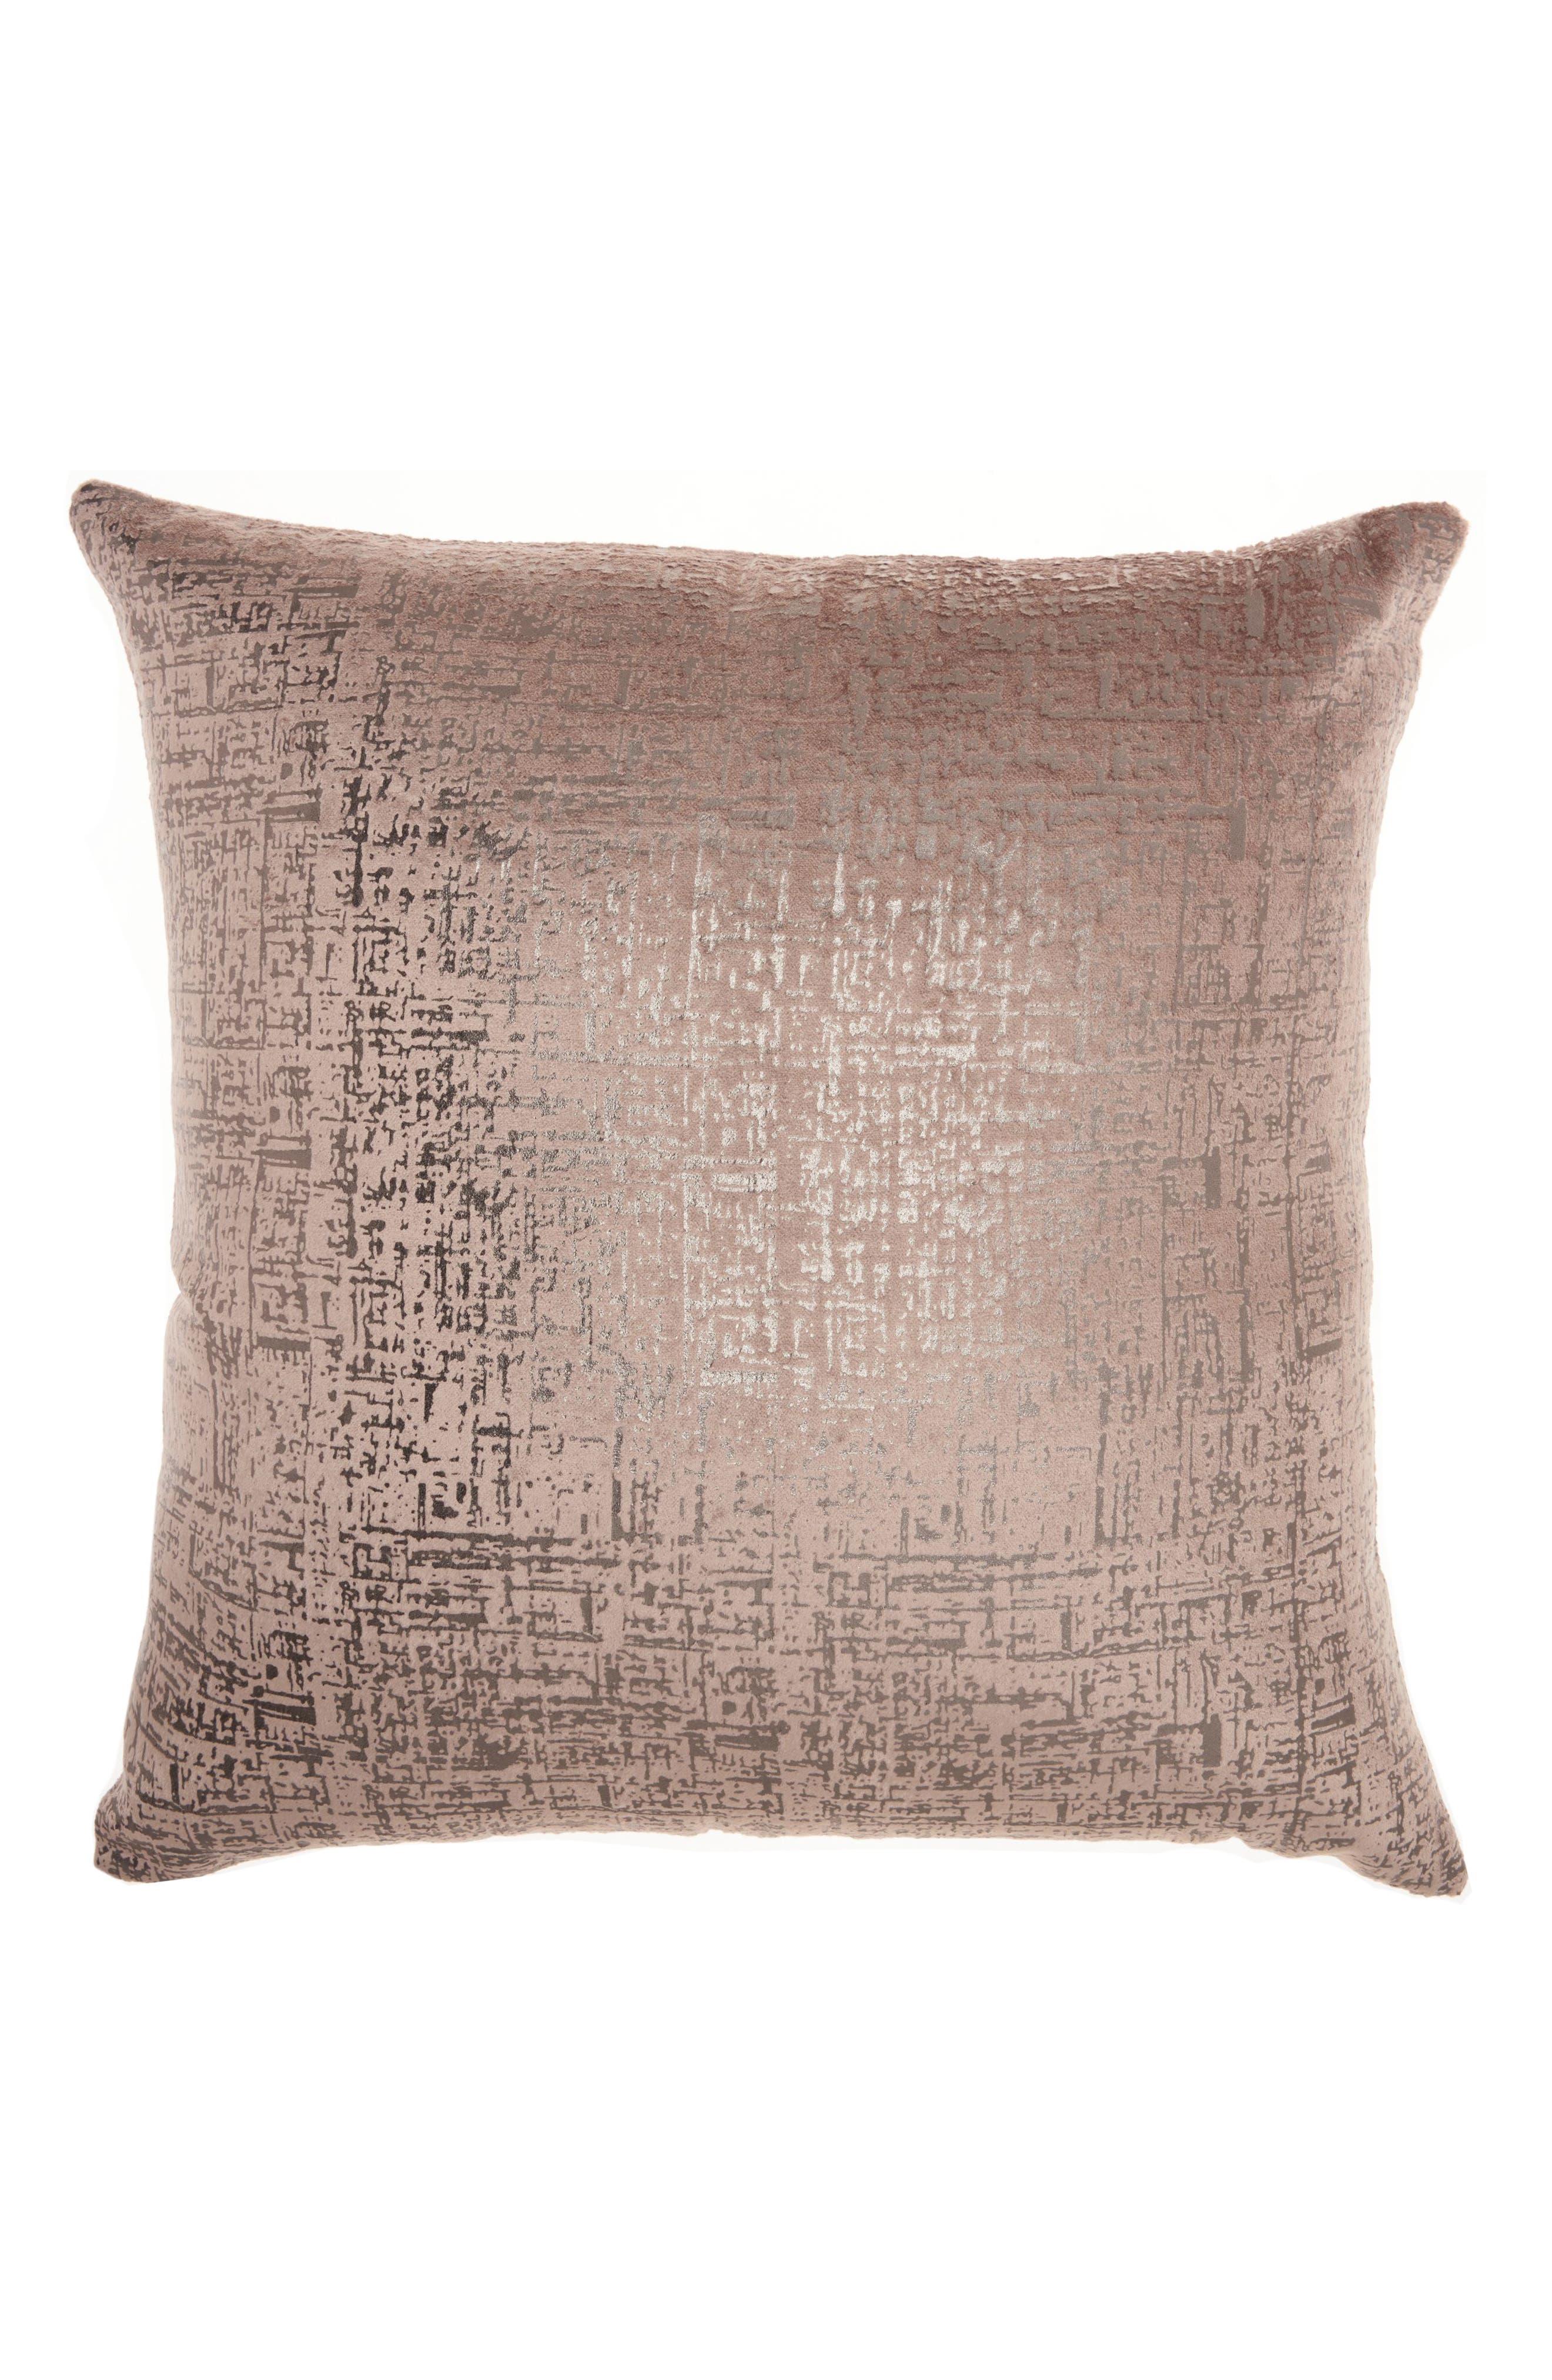 Distressed Velvet Accent Pillow,                         Main,                         color, Beige